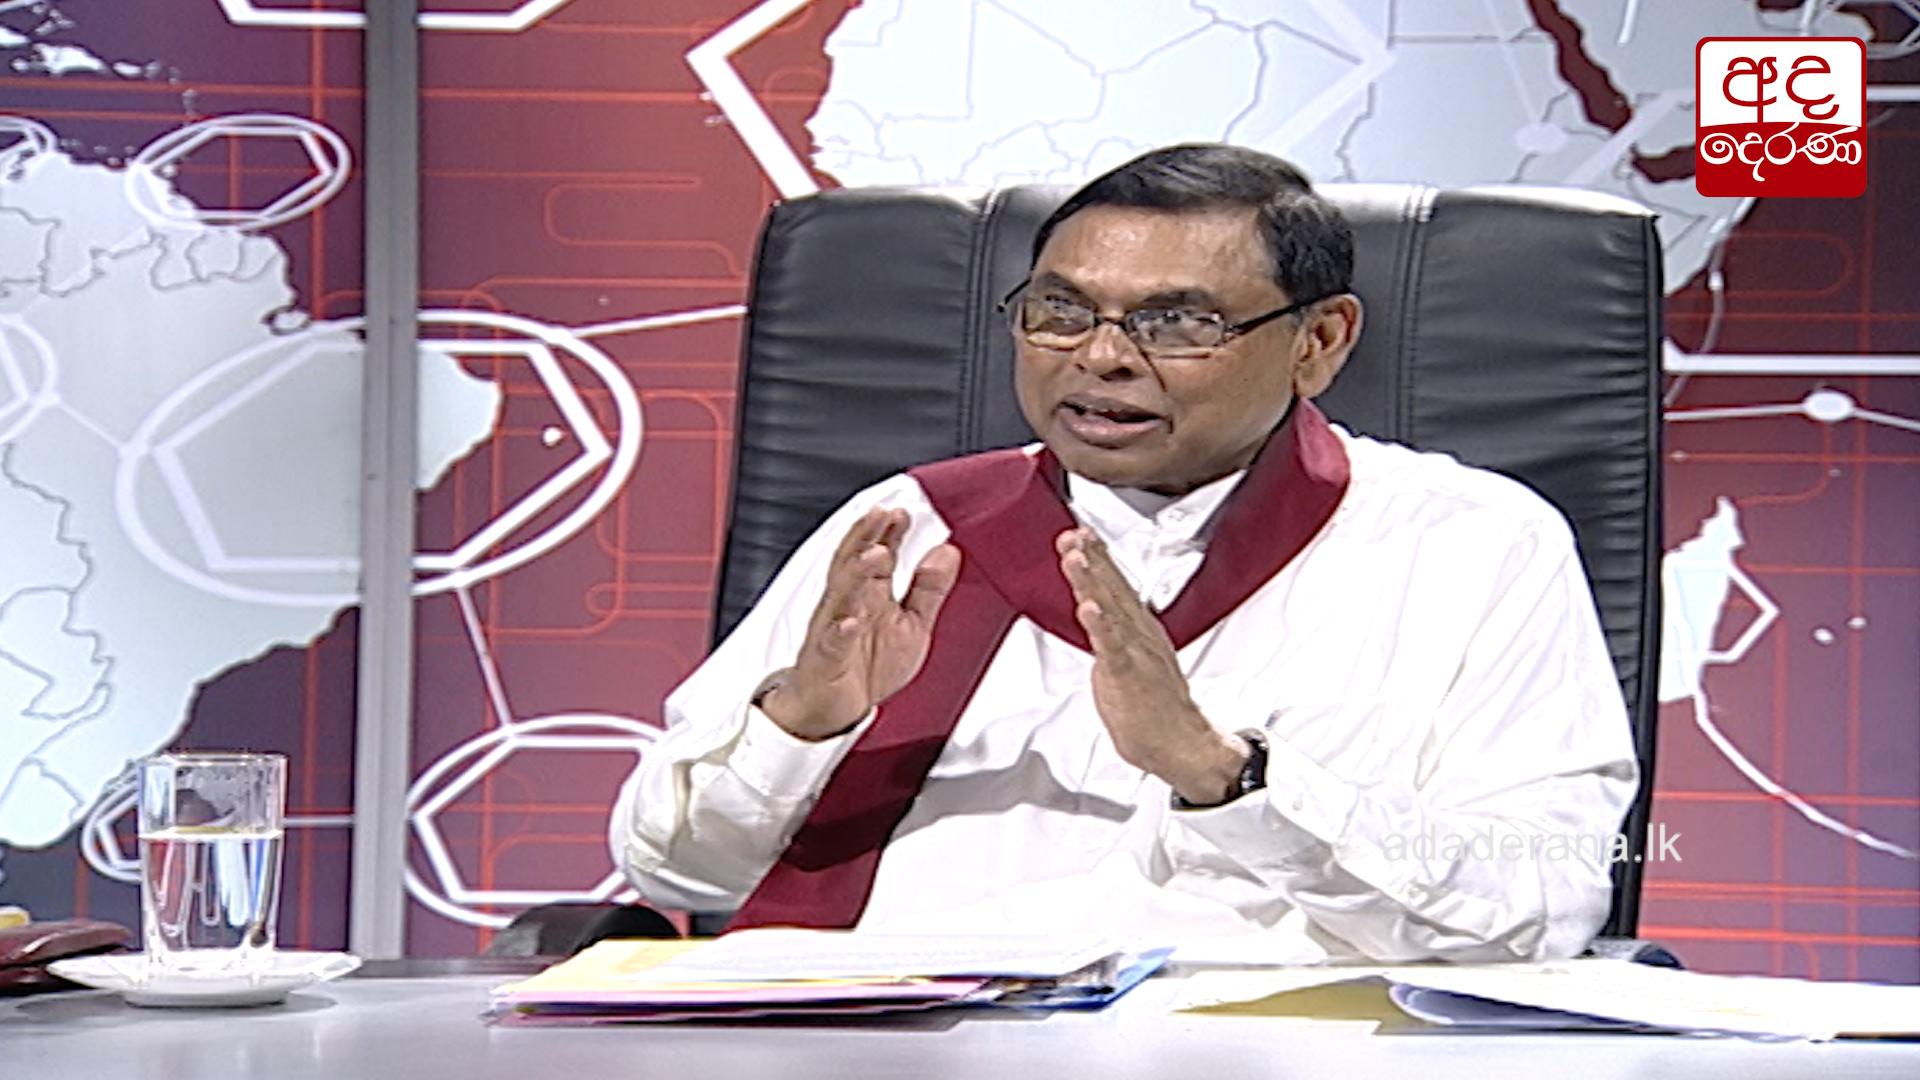 Govt ready to address food, medicine crises of people - Basil